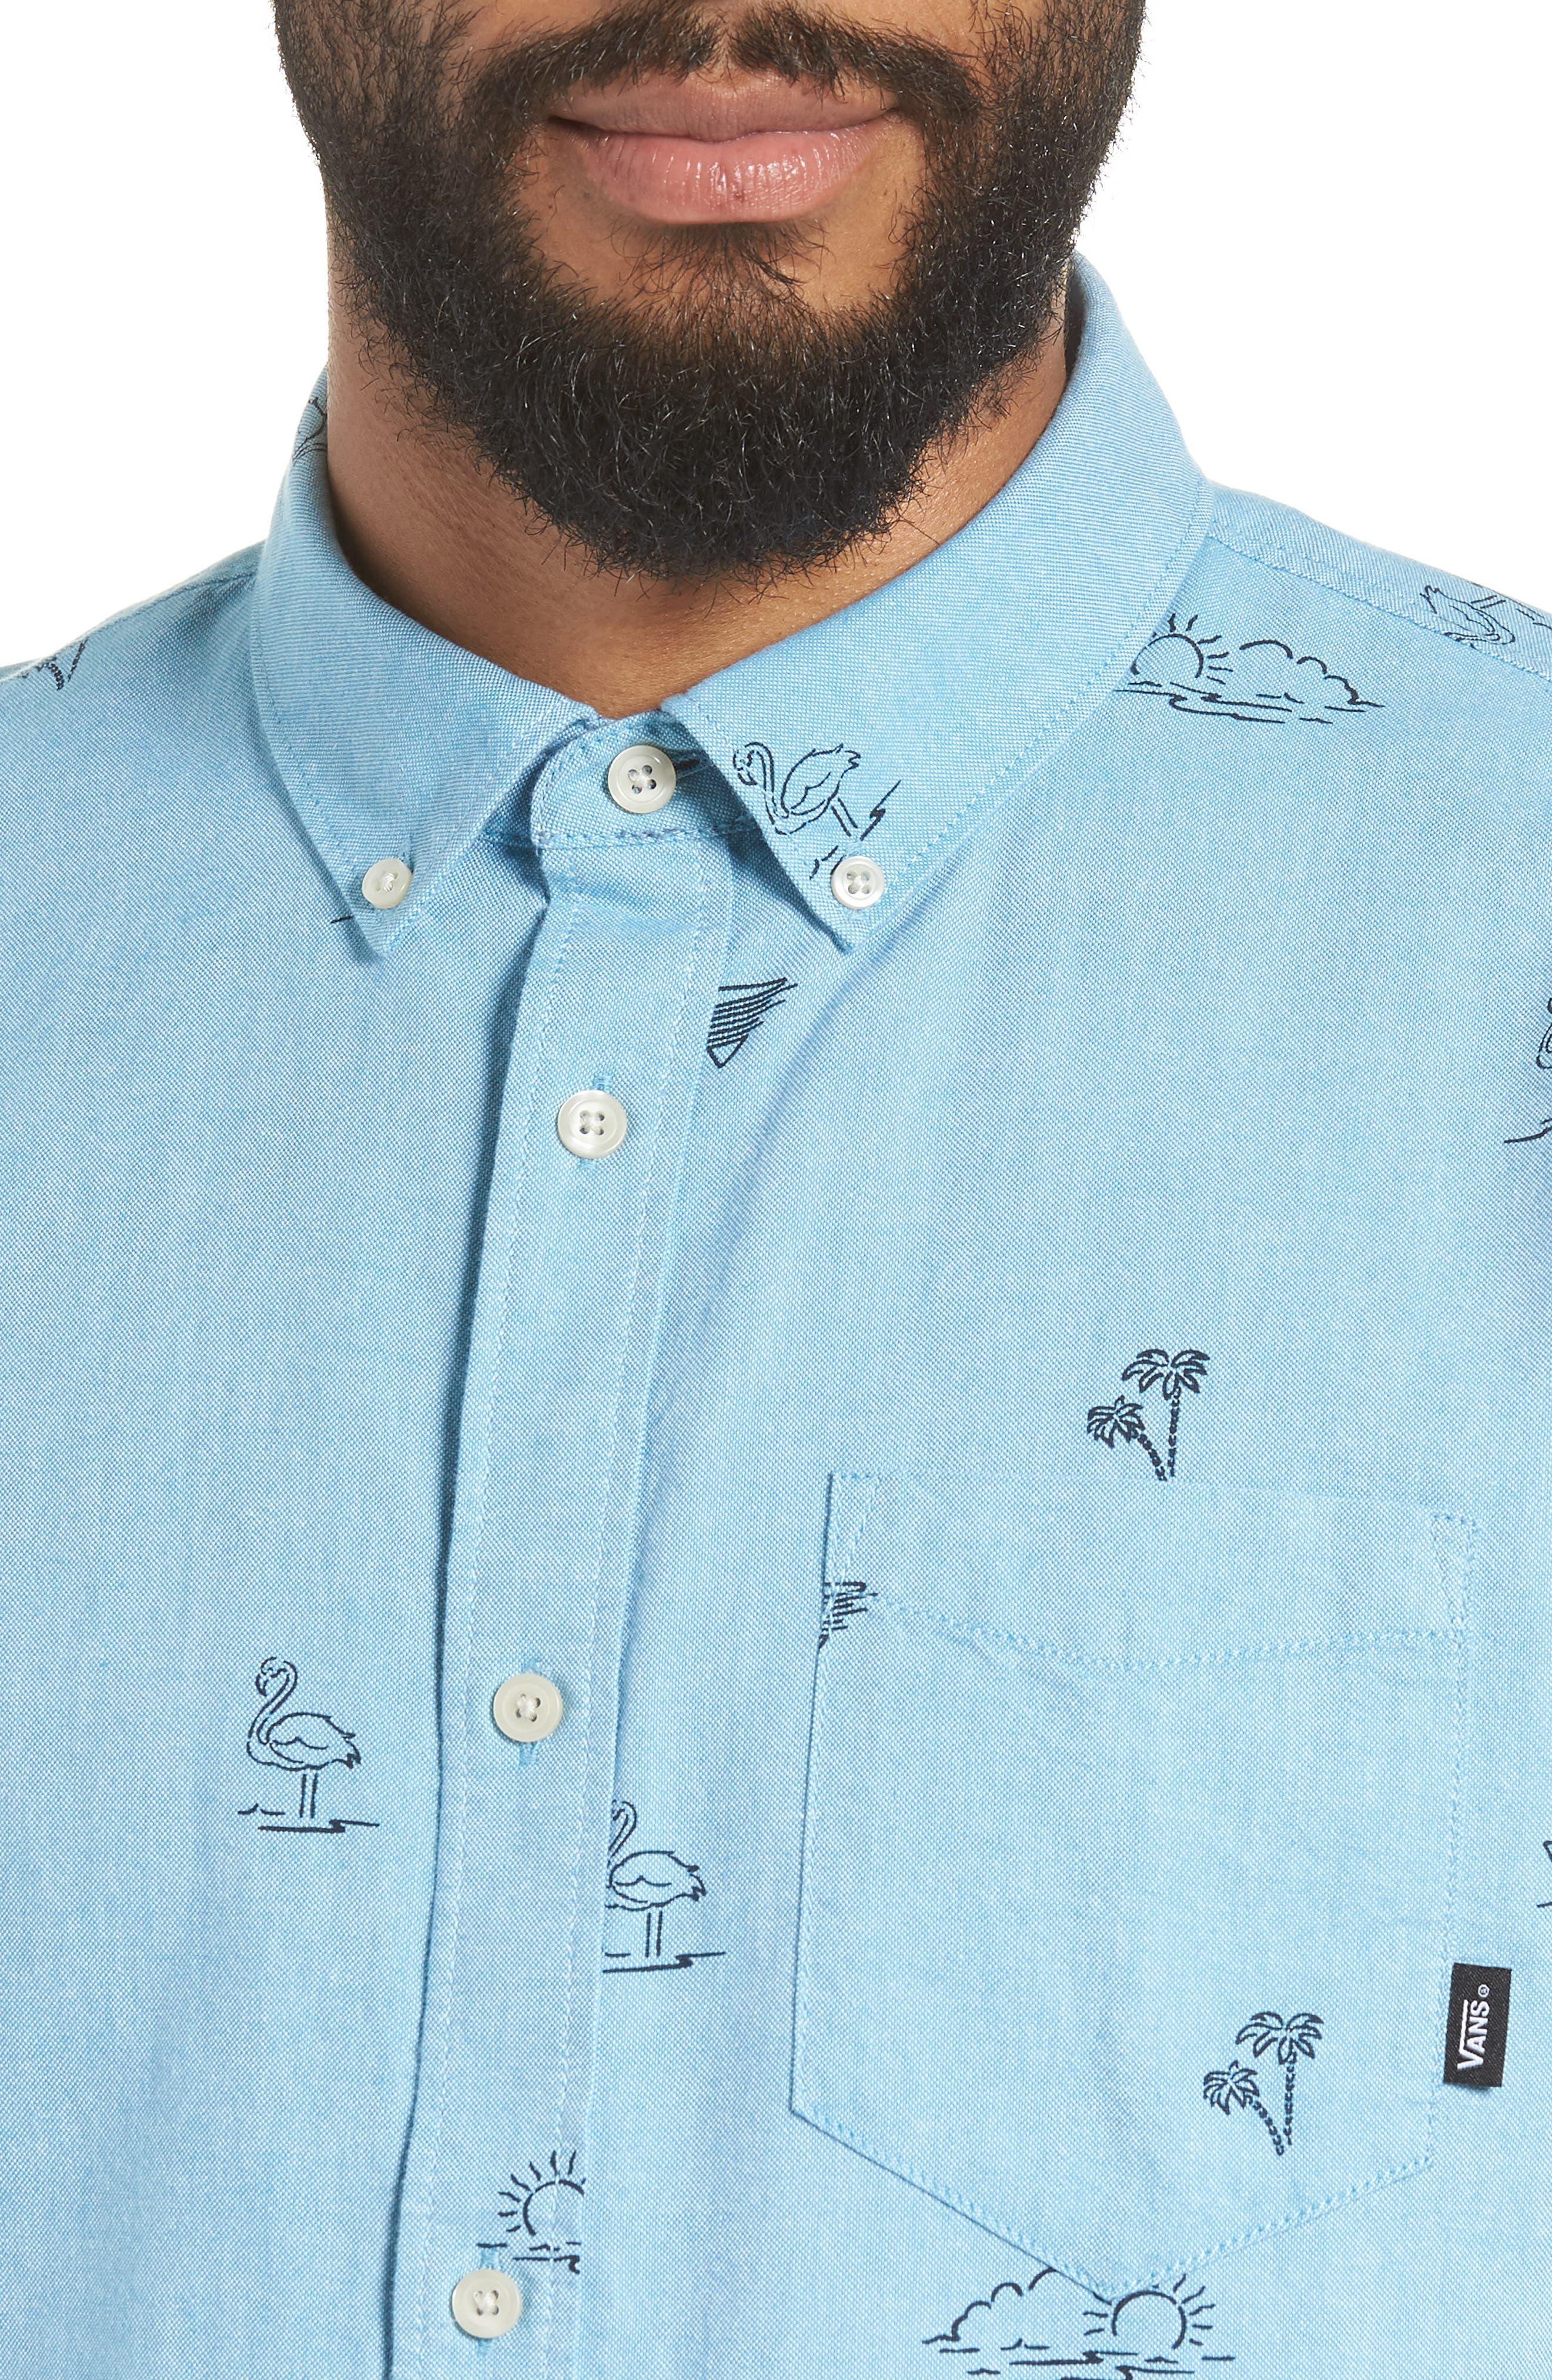 Houser Woven Shirt,                             Alternate thumbnail 2, color,                             Blue Moon Road Trippin